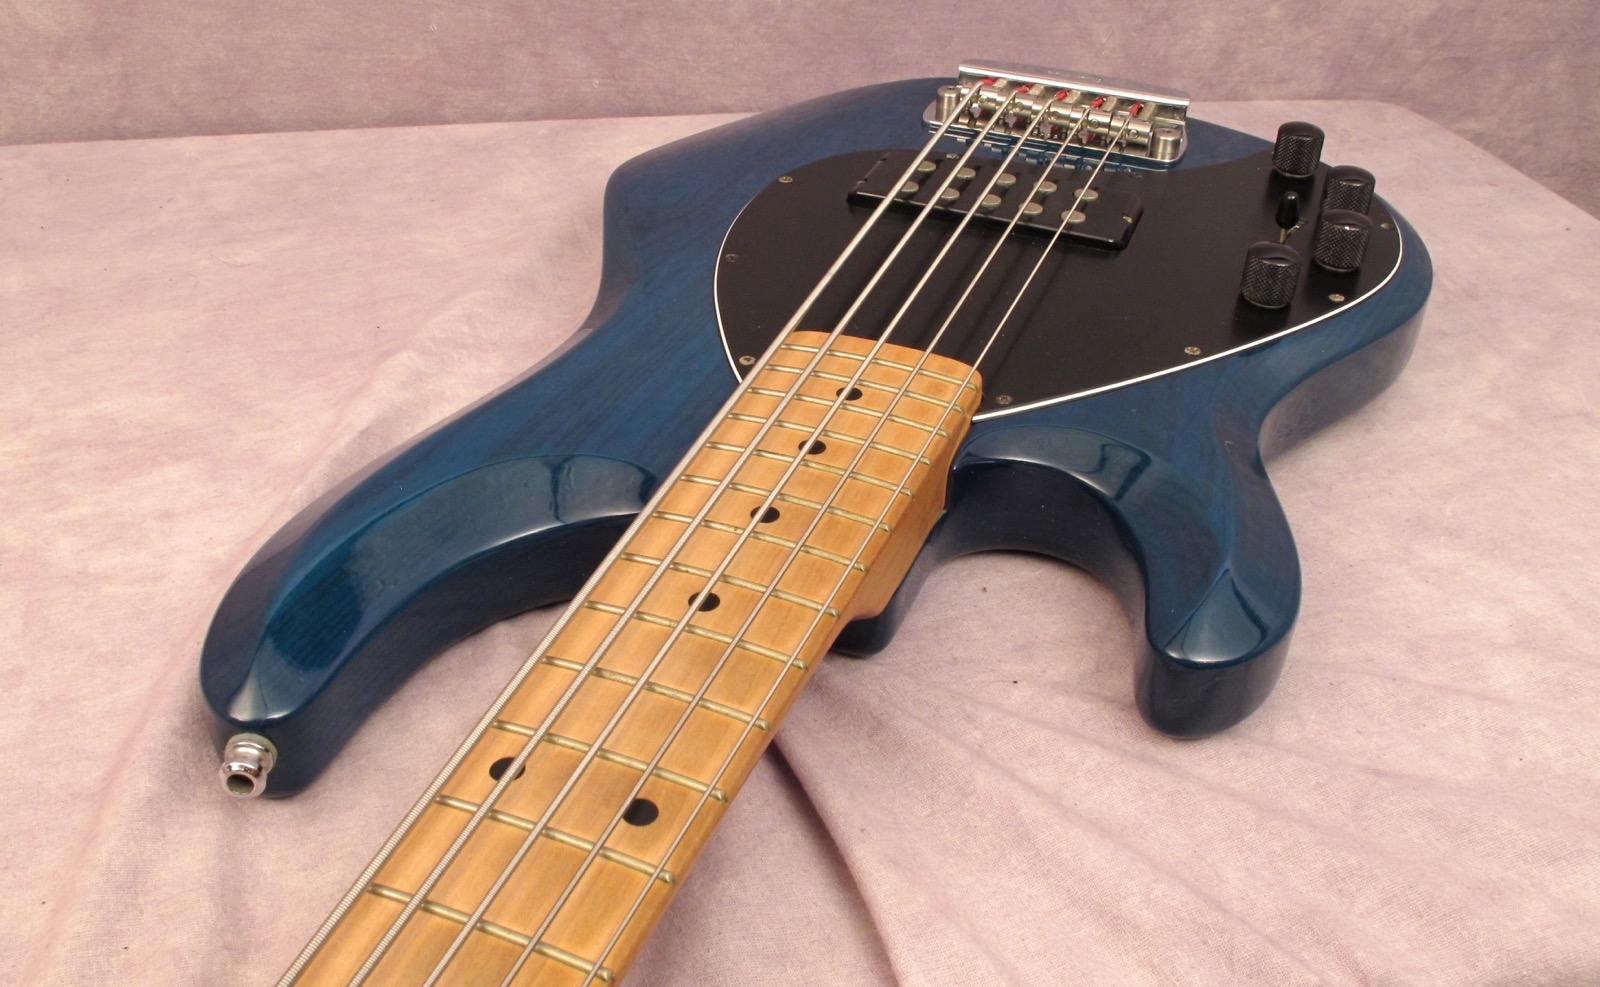 music man stingray 5 2000 teal green bass for sale andy baxter bass guitars ltd. Black Bedroom Furniture Sets. Home Design Ideas